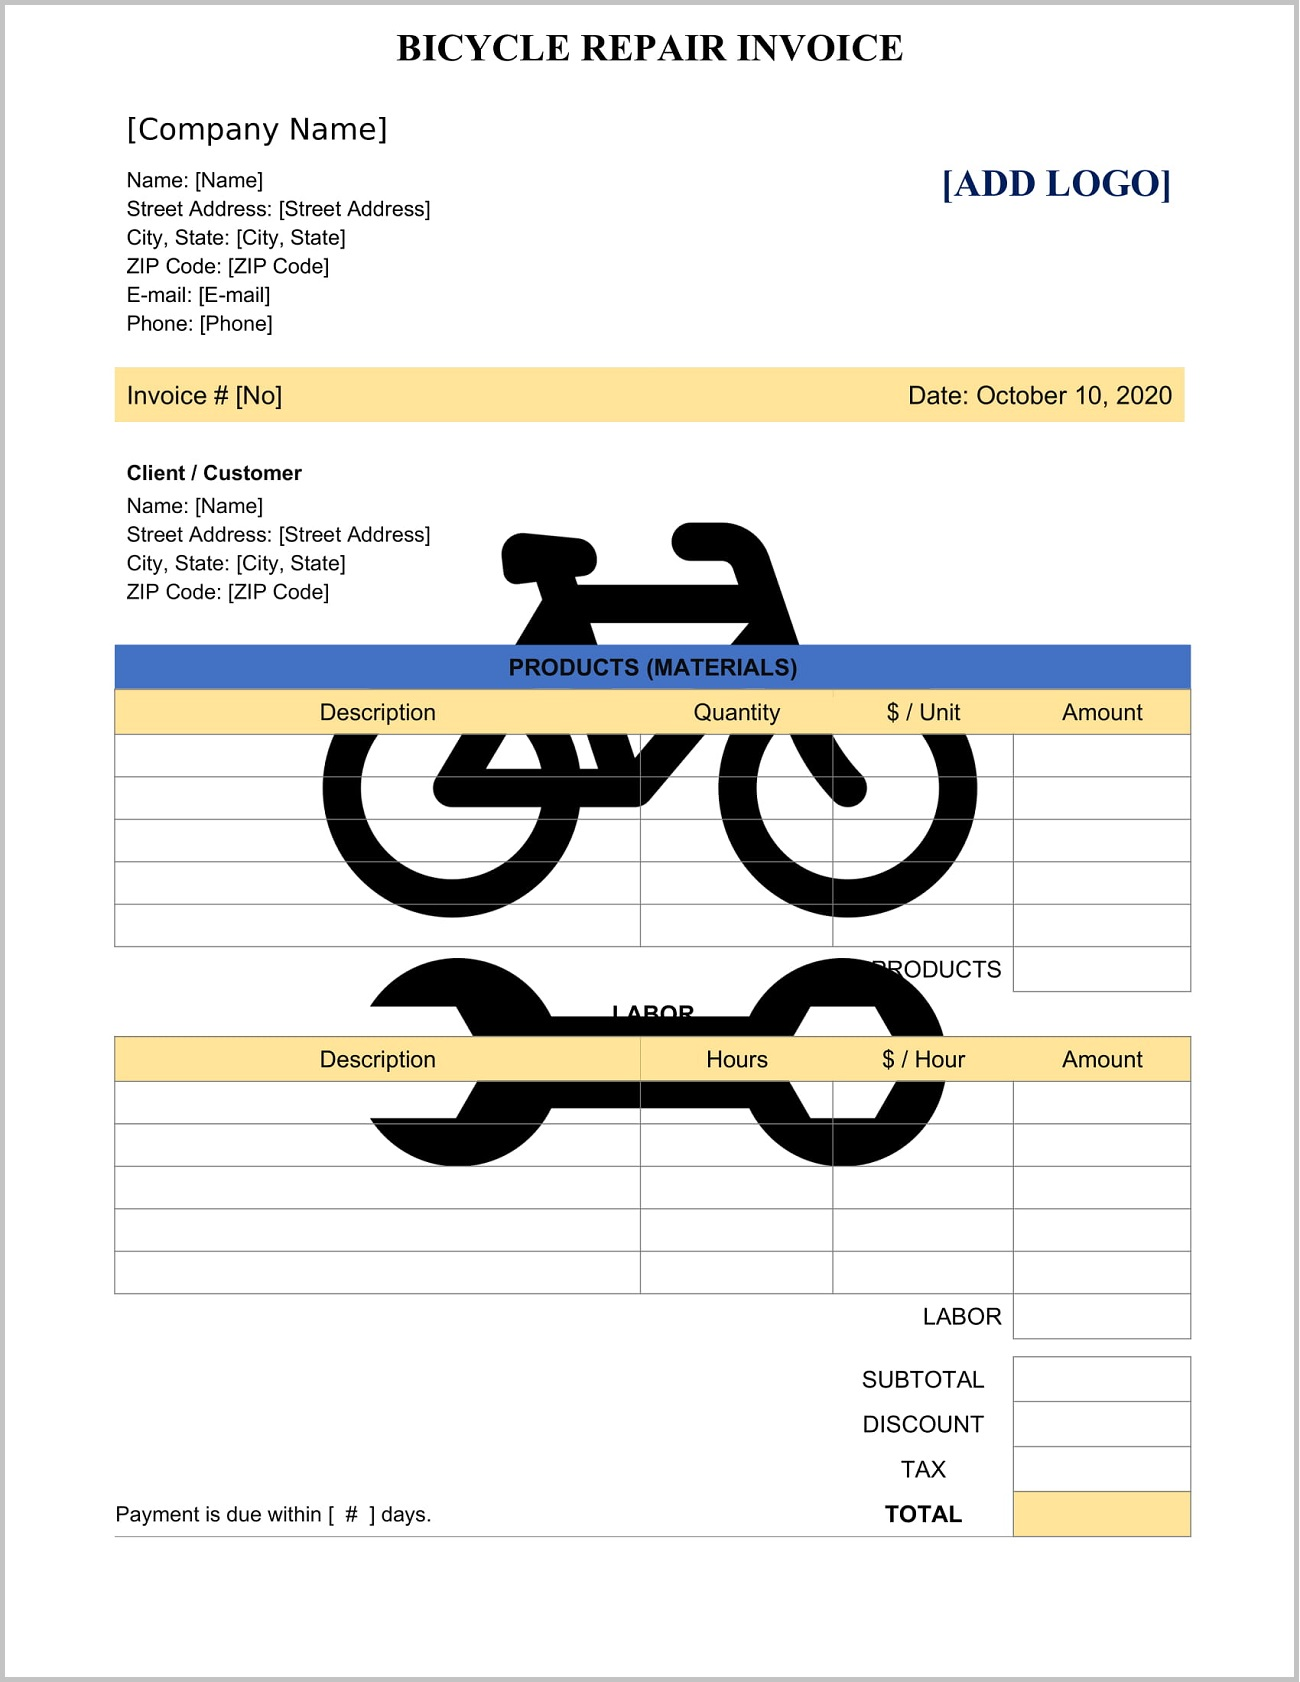 Bicycle Repair Invoice Template Word